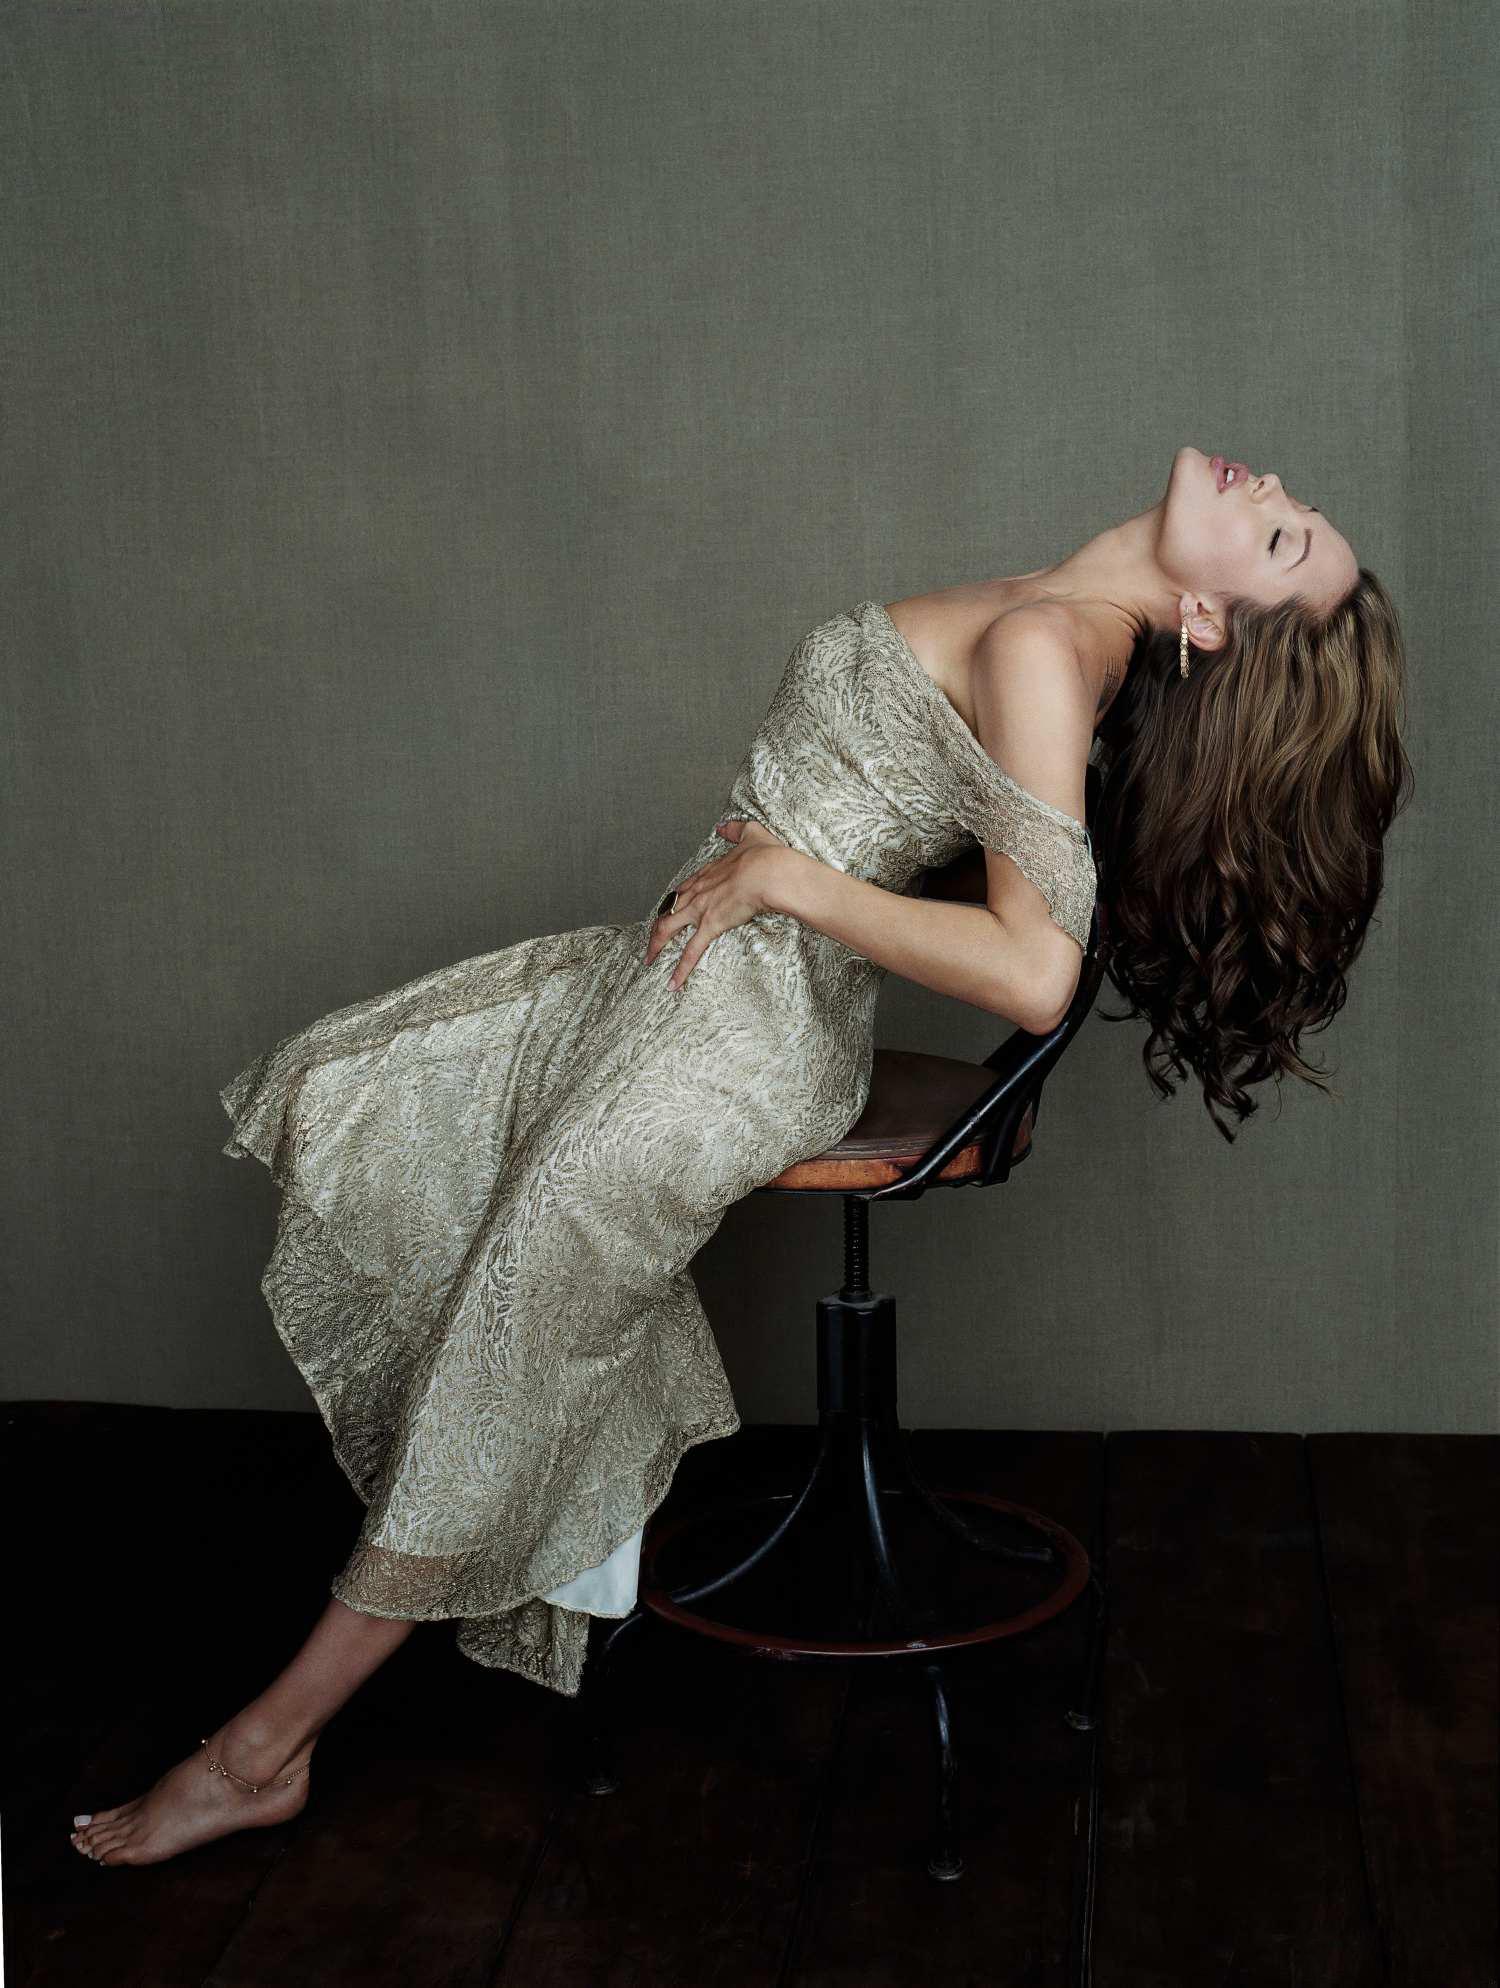 Scarlett johansson yariv milchan 2004 uhq photo shoot nude (61 photo)